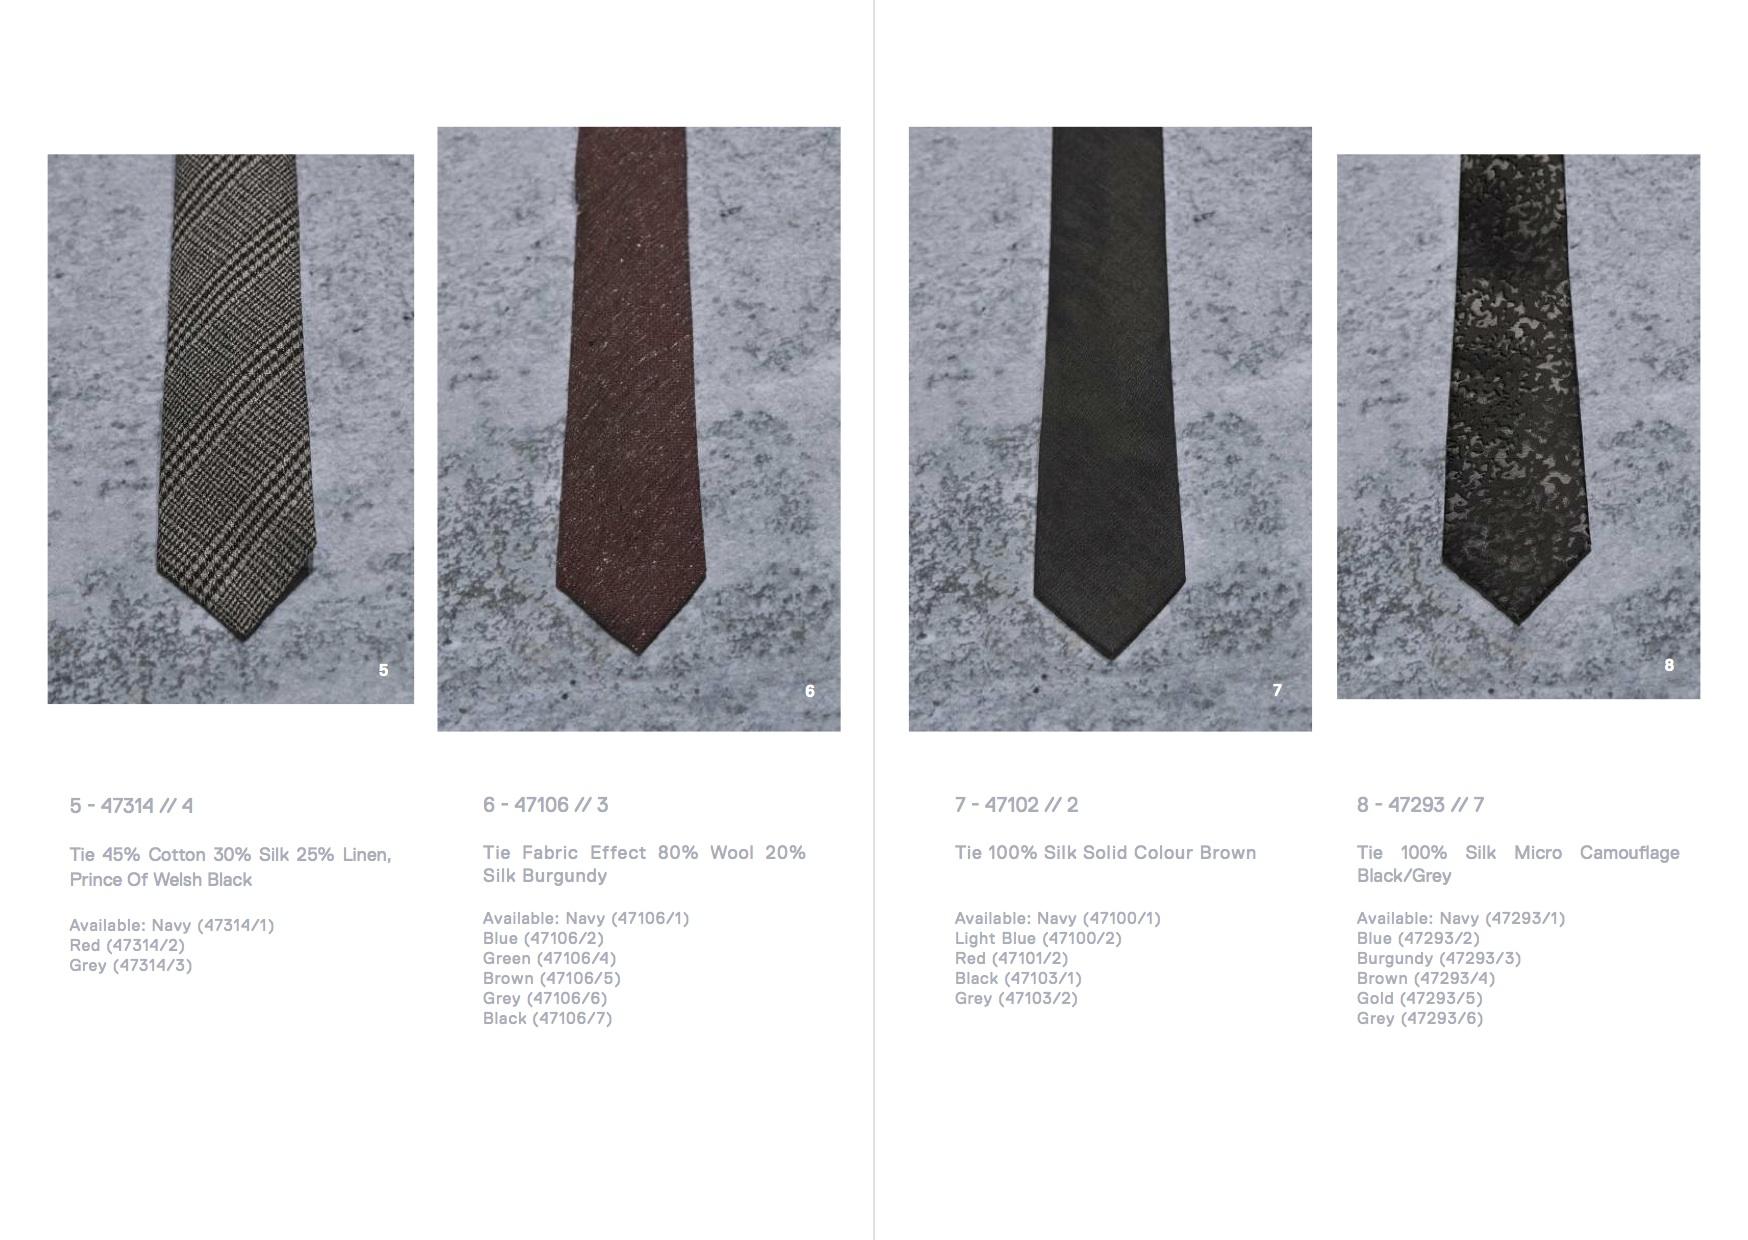 lookbook cerruti - Accessories 17.18- print.compressed16.jpg